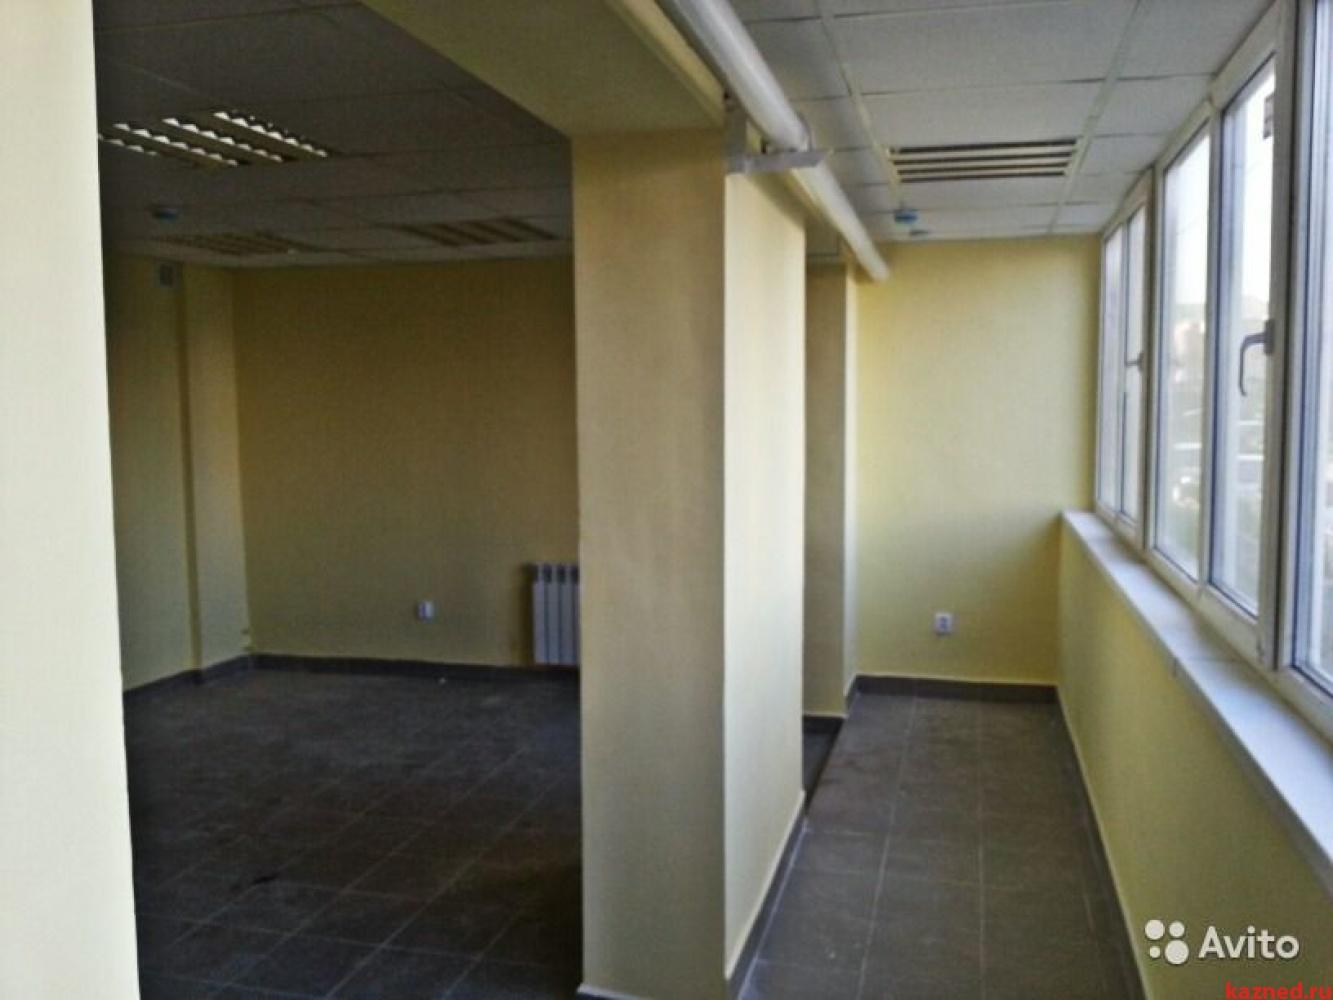 Продажа  помещения свободного назначения Академика Сахарова, 10, 74 м2  (миниатюра №2)